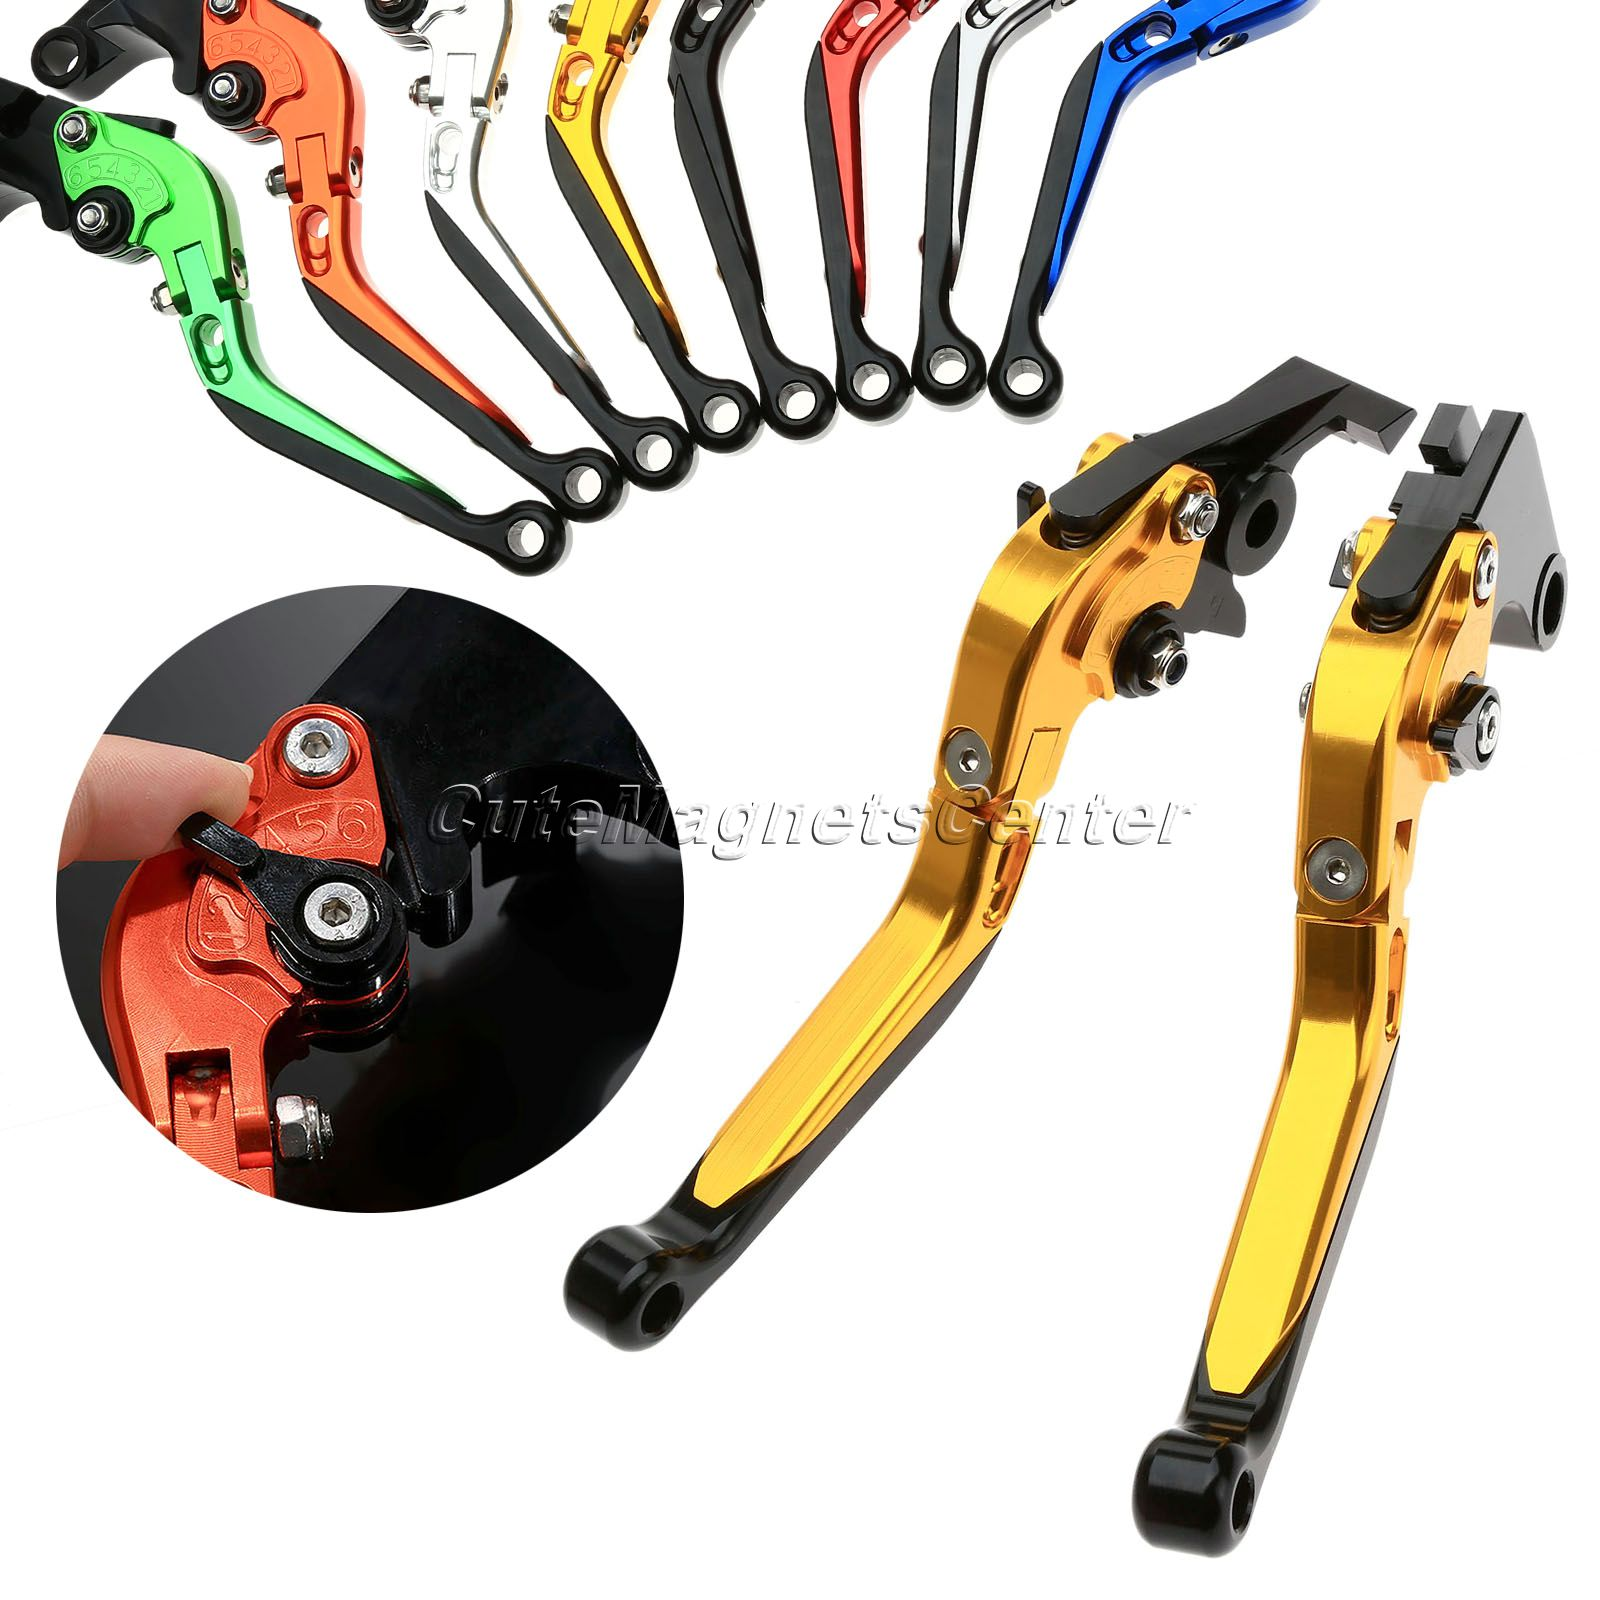 Mtsooning CNC Aluminum Foldable Extendable Adjustable Motorbike Brake Clutch Levers For Aprilia Pegaso 650 2006  цена и фото